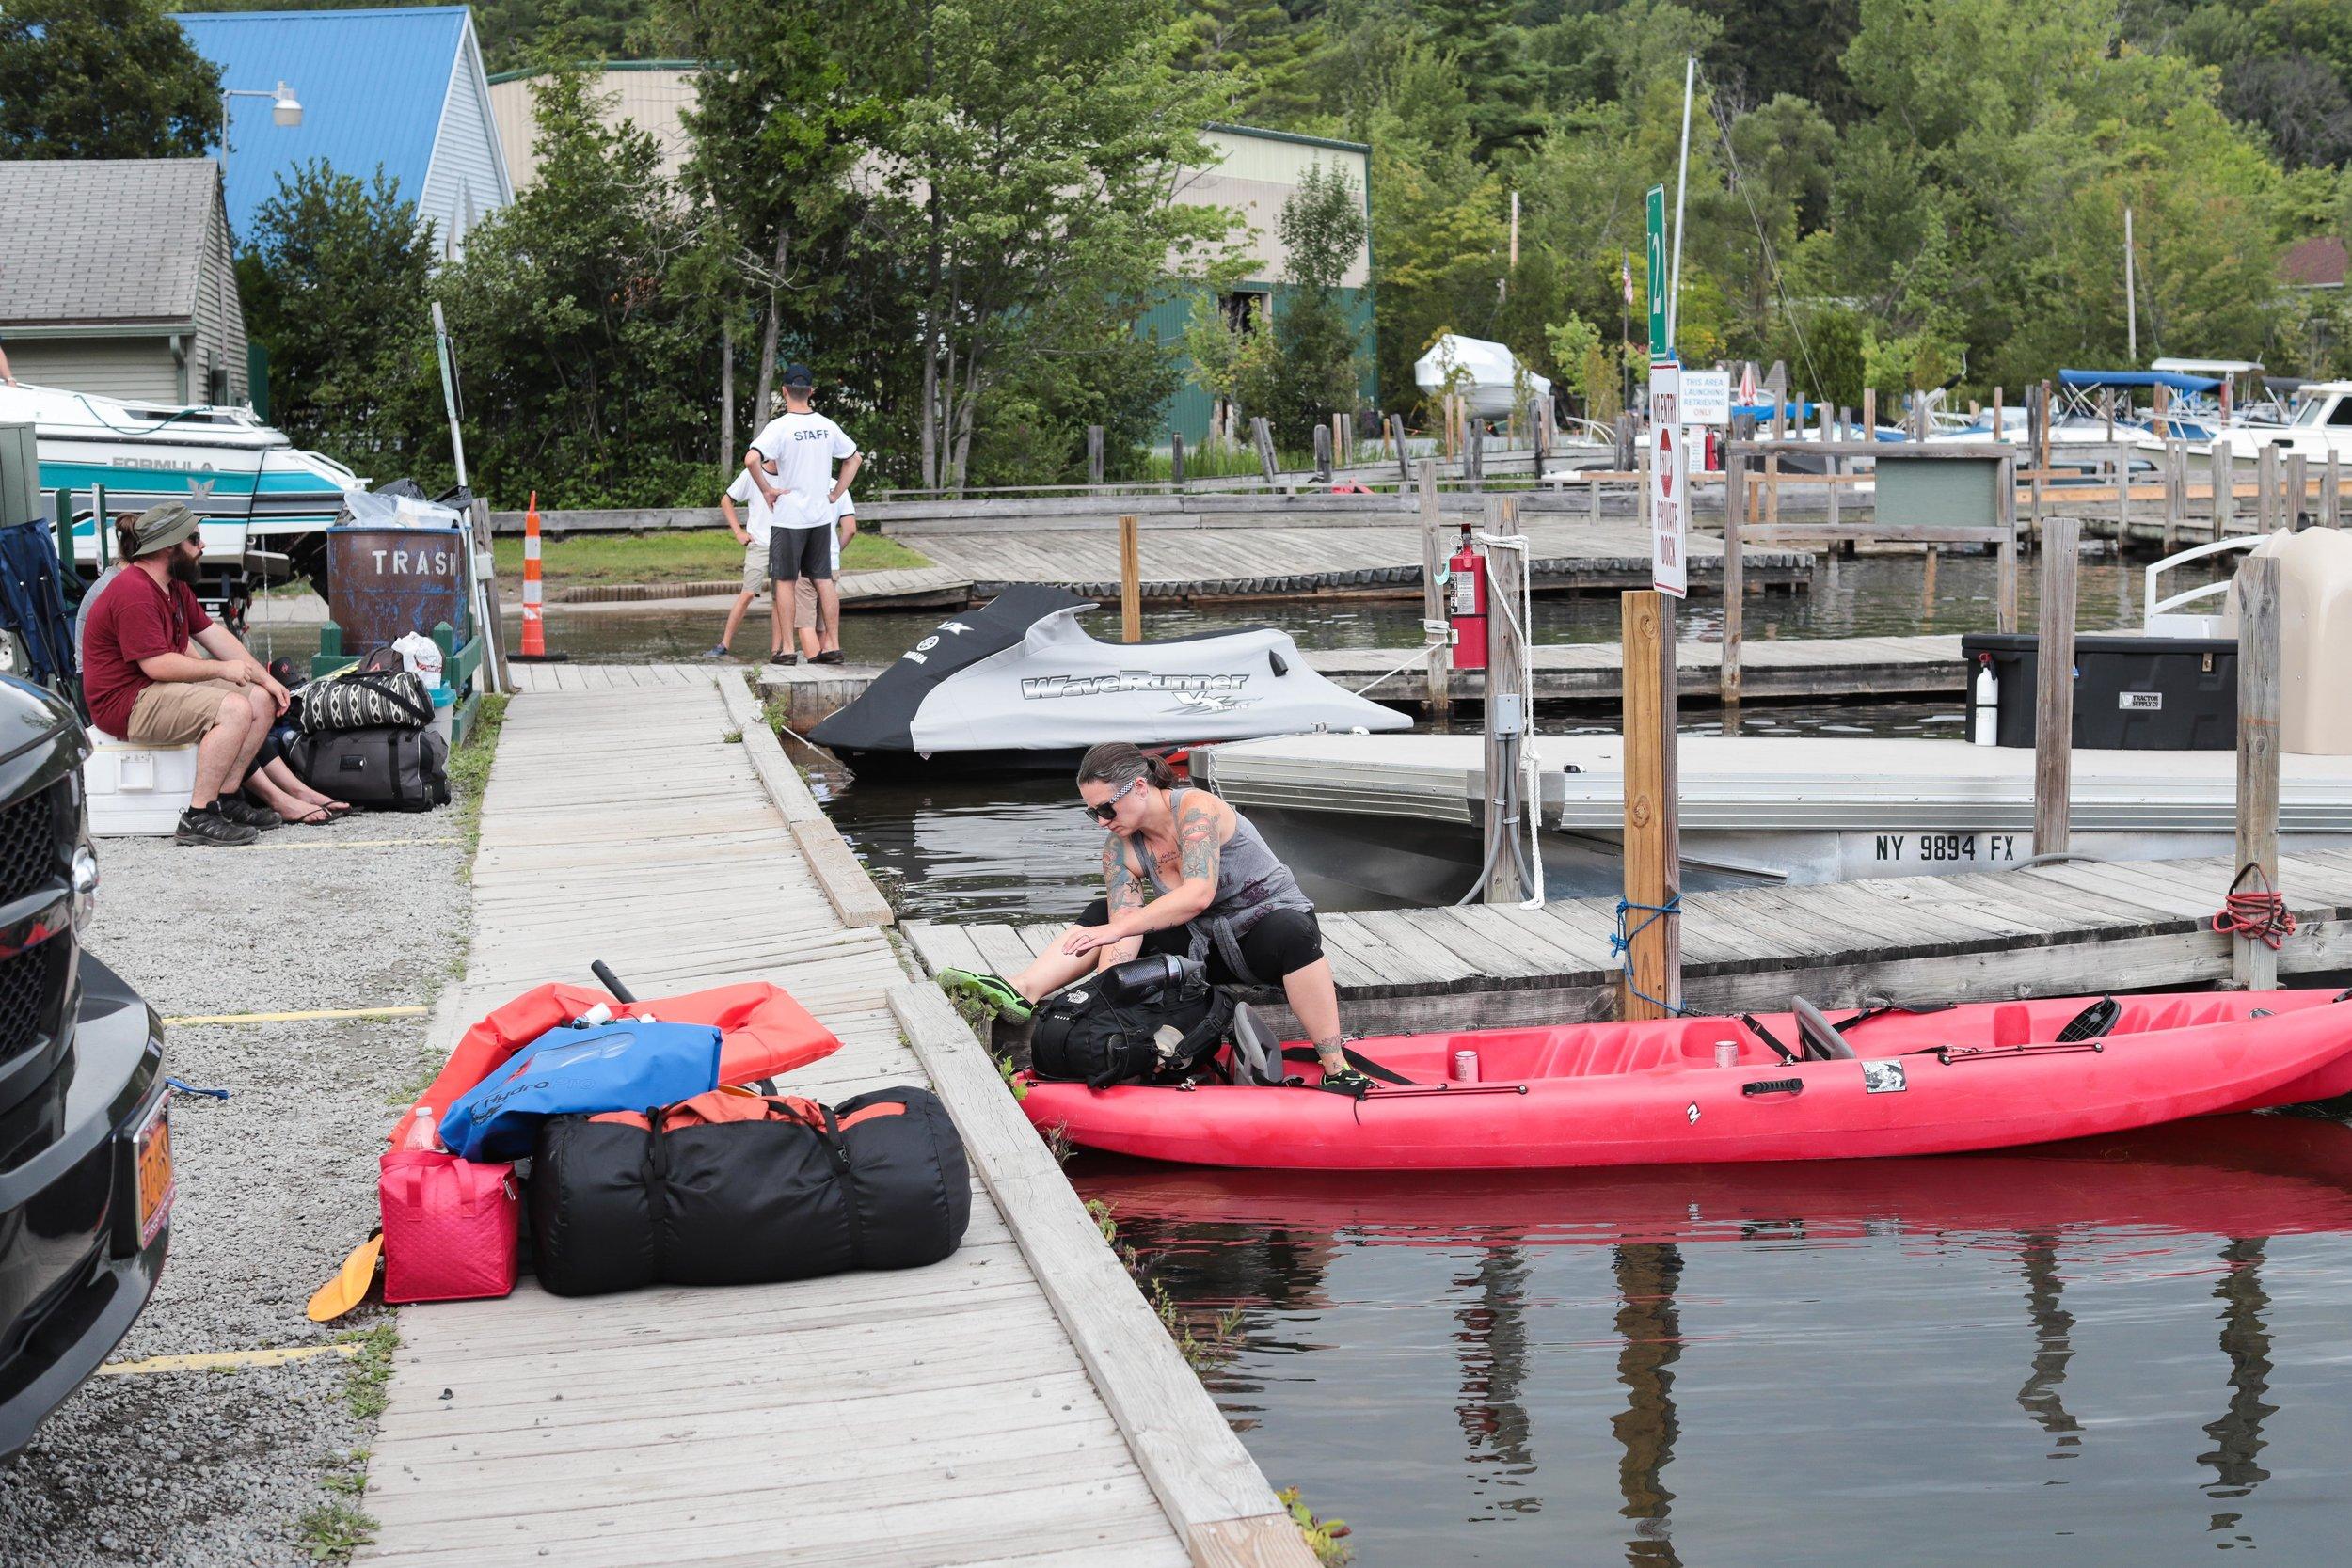 Loading up the kayak